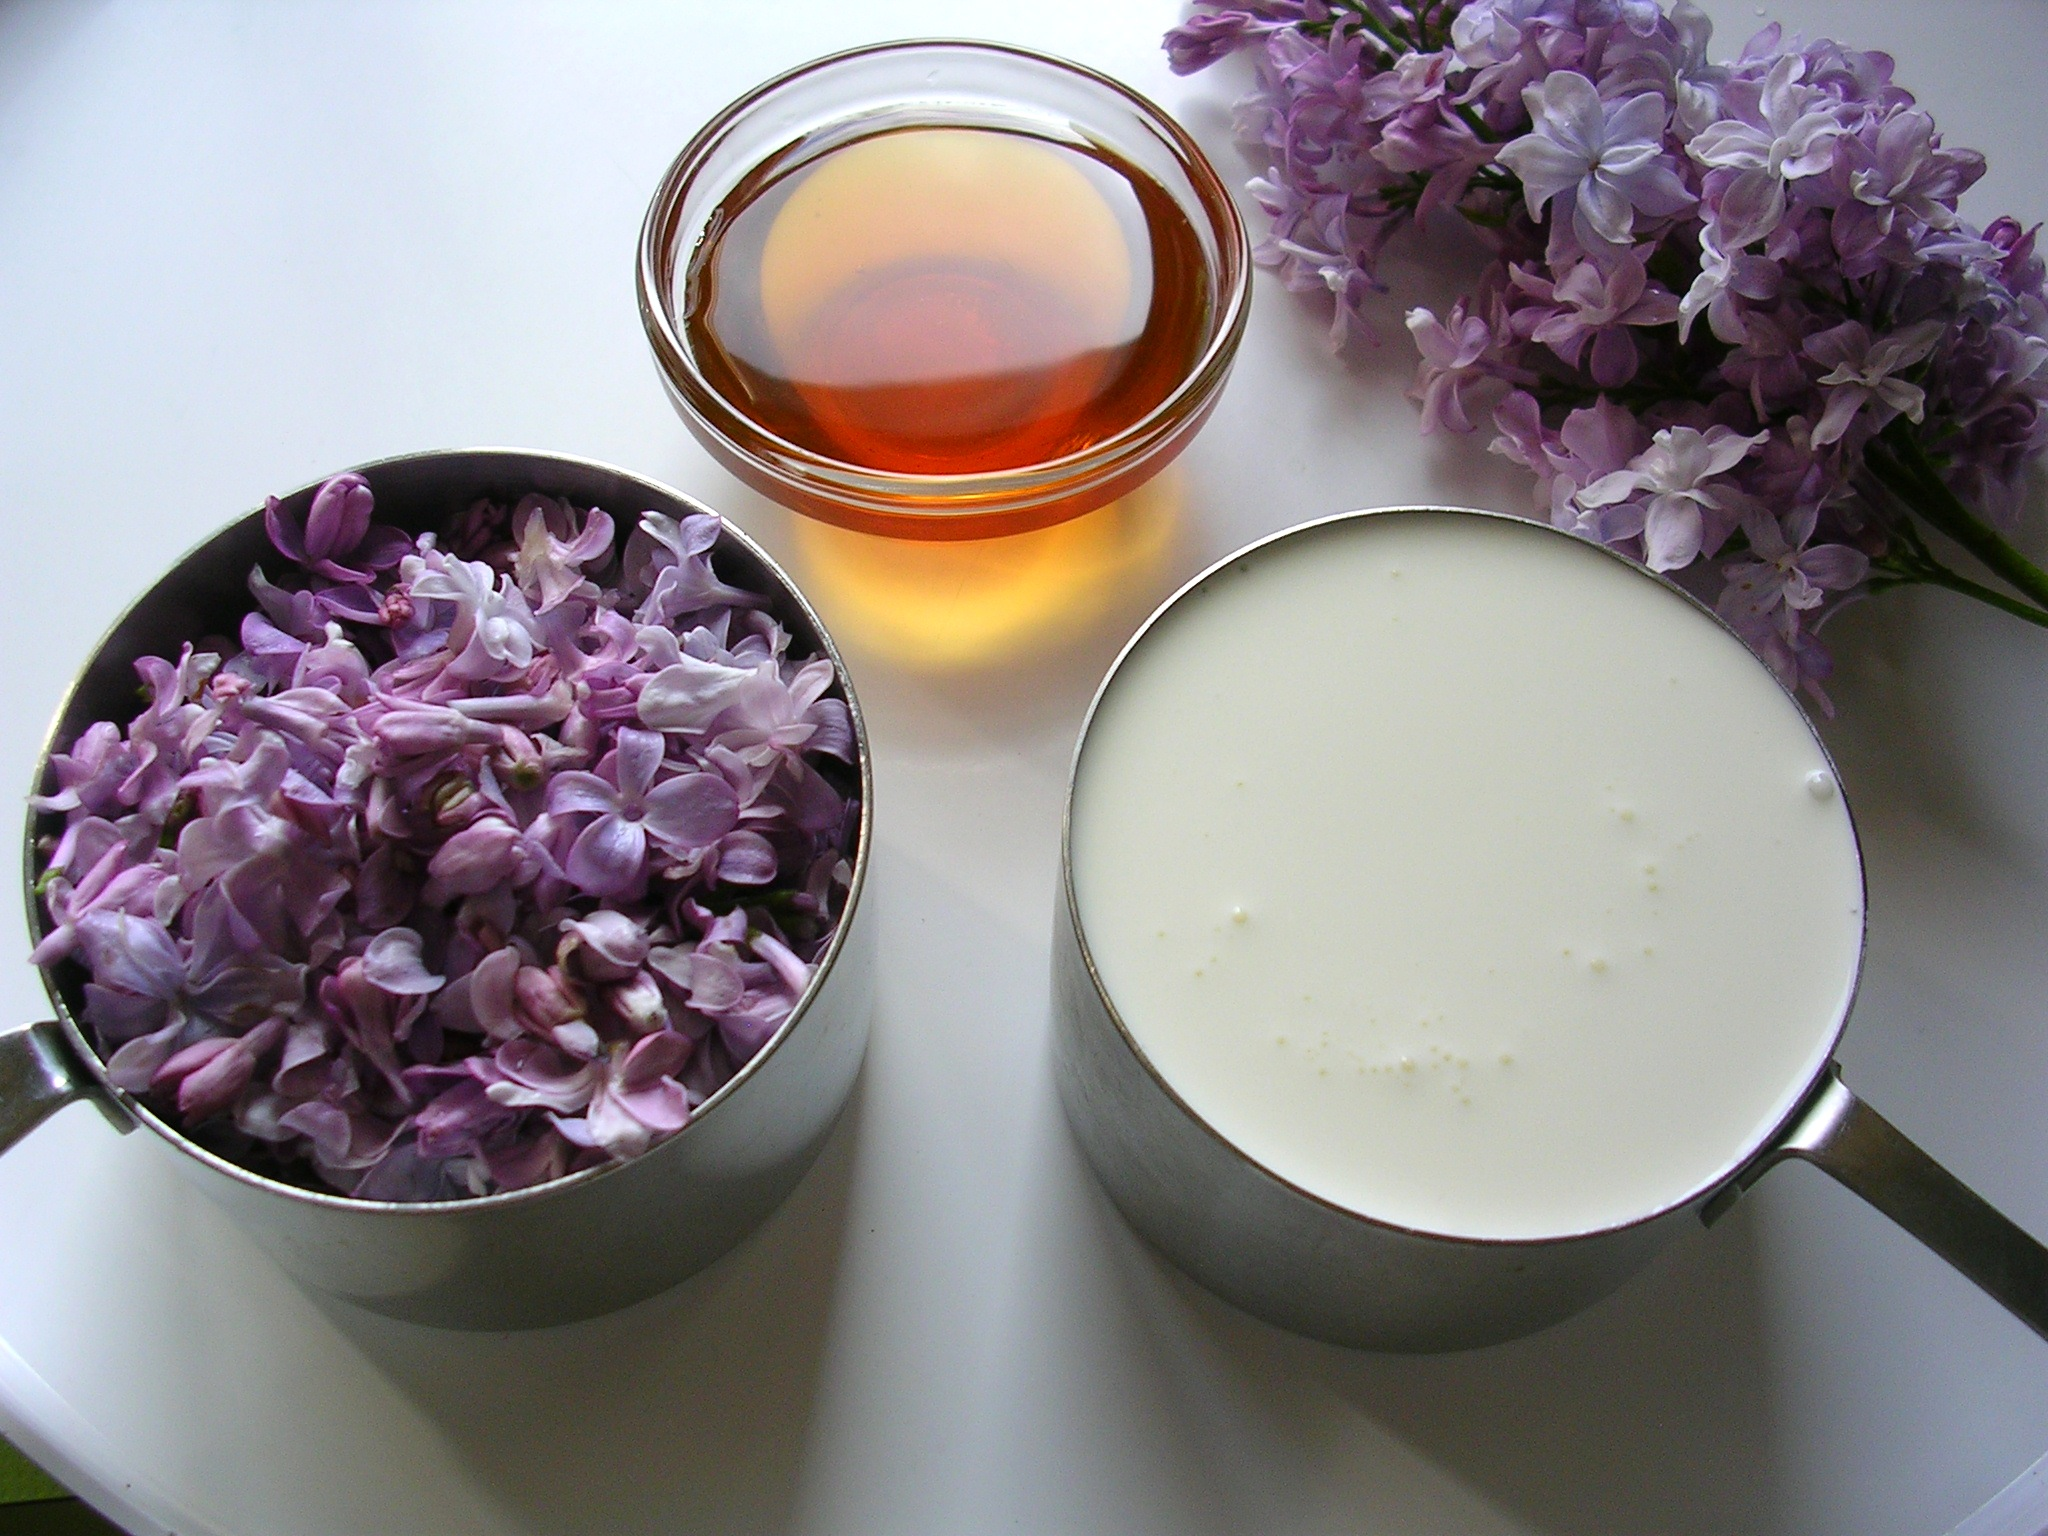 lilac-parfait-ingredients.jpg